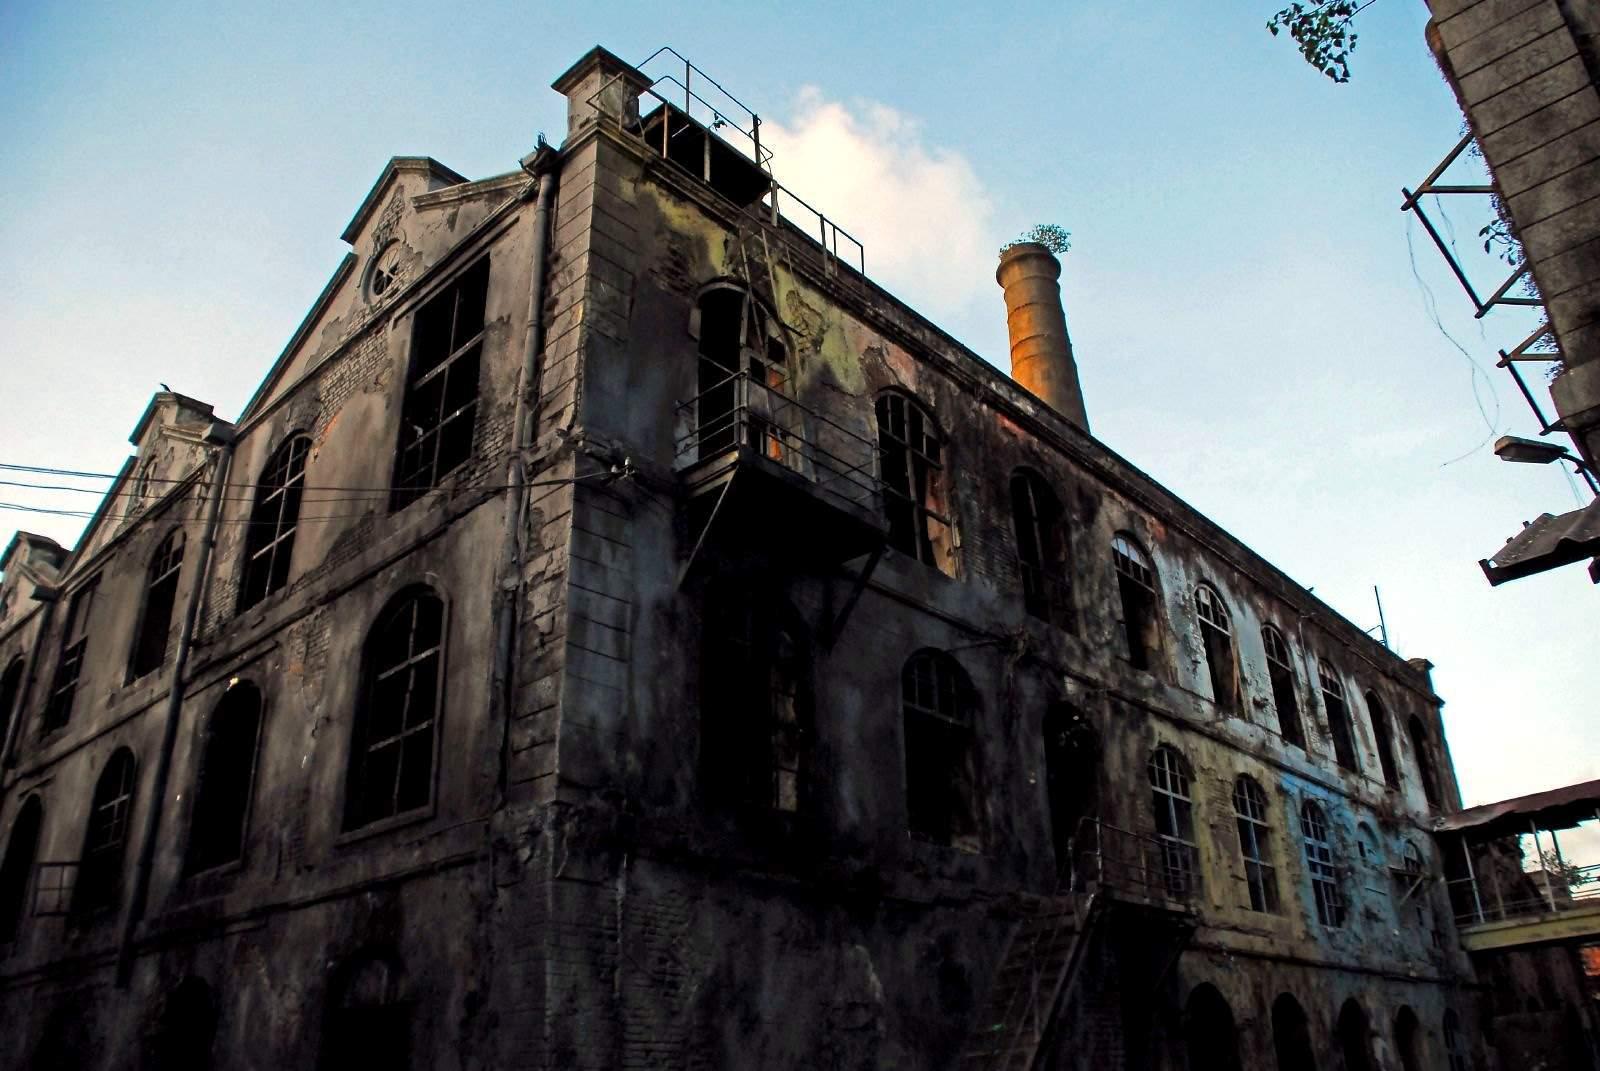 Mukesh Mills – The terrifying story behind the abandoned 19th-century textile mills in Mumbai 3